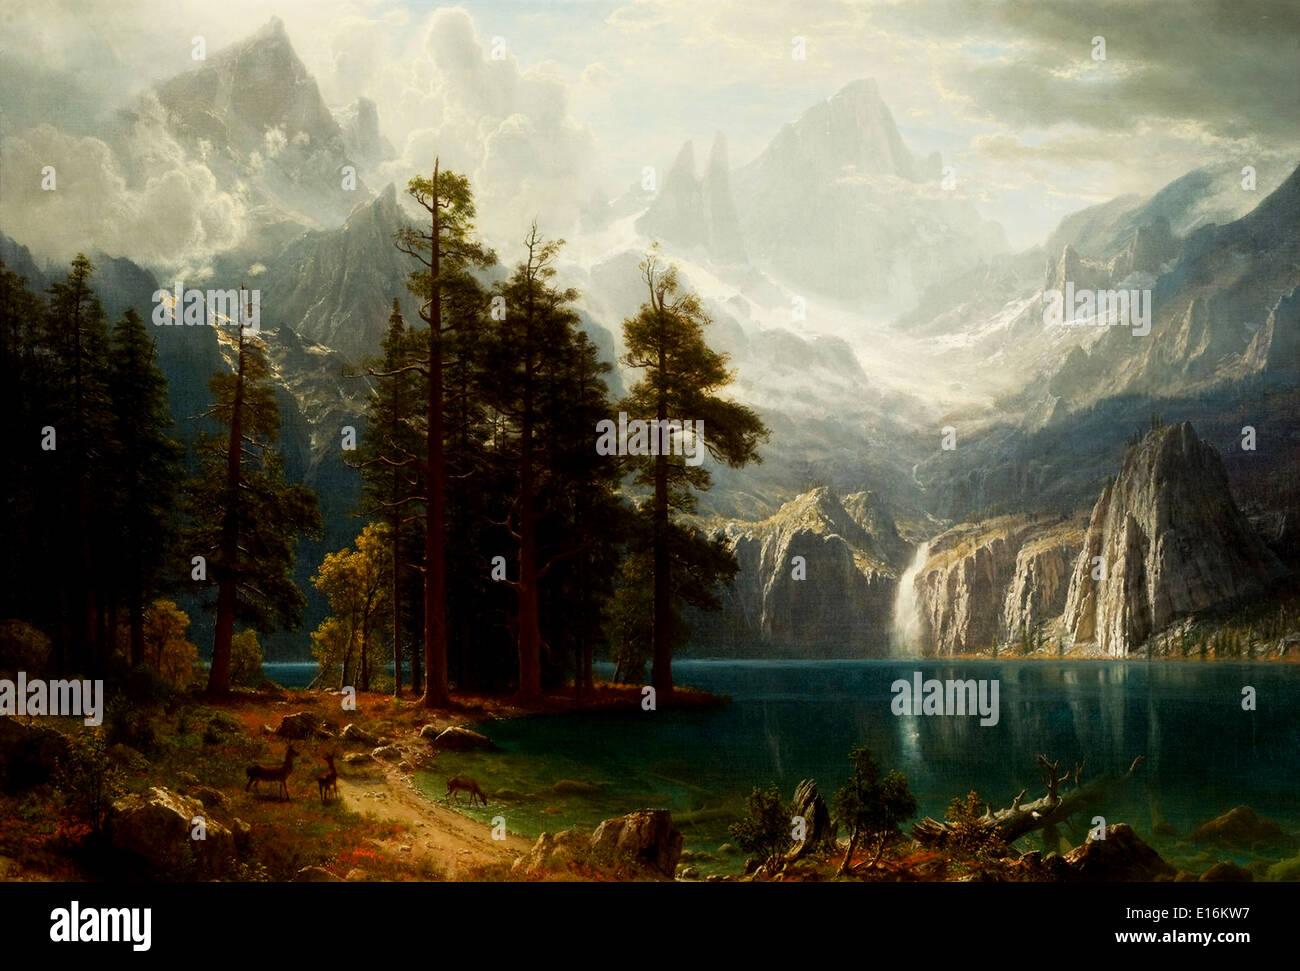 Sierra Nevada by Albert Bierstadt, 1871 - Stock Image